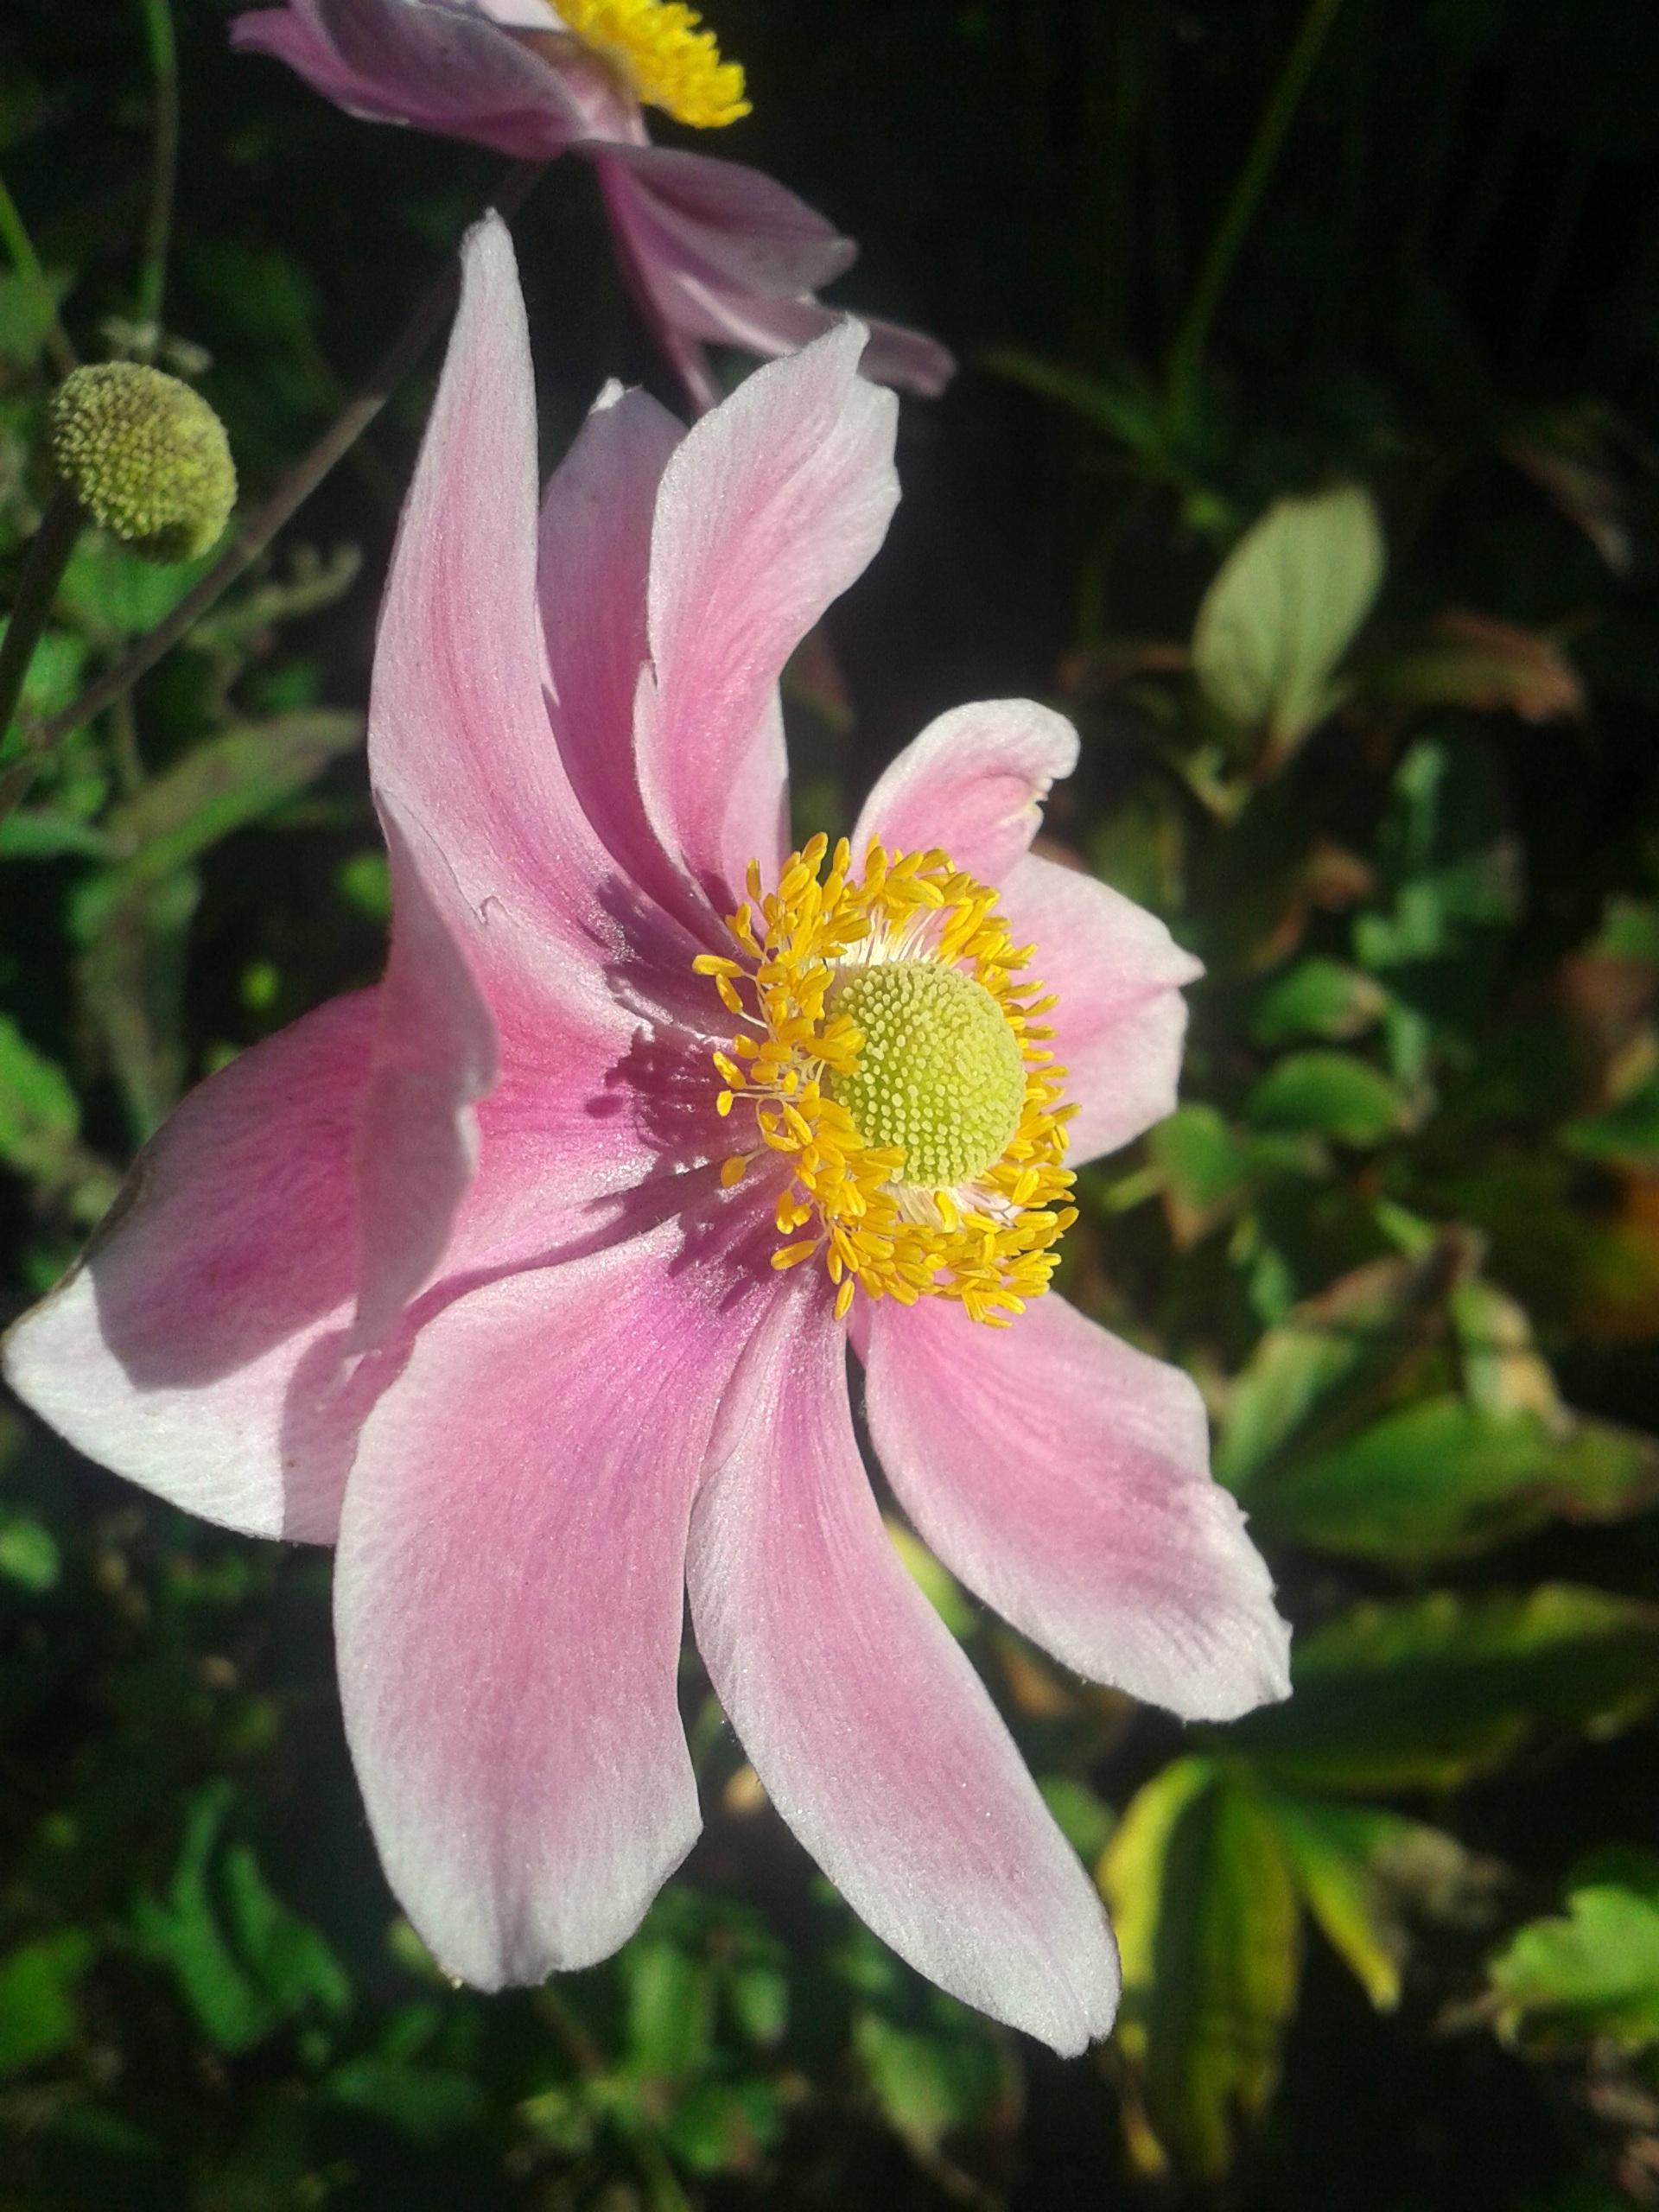 Free Images Flower Petal Drive Botany Flora Plants